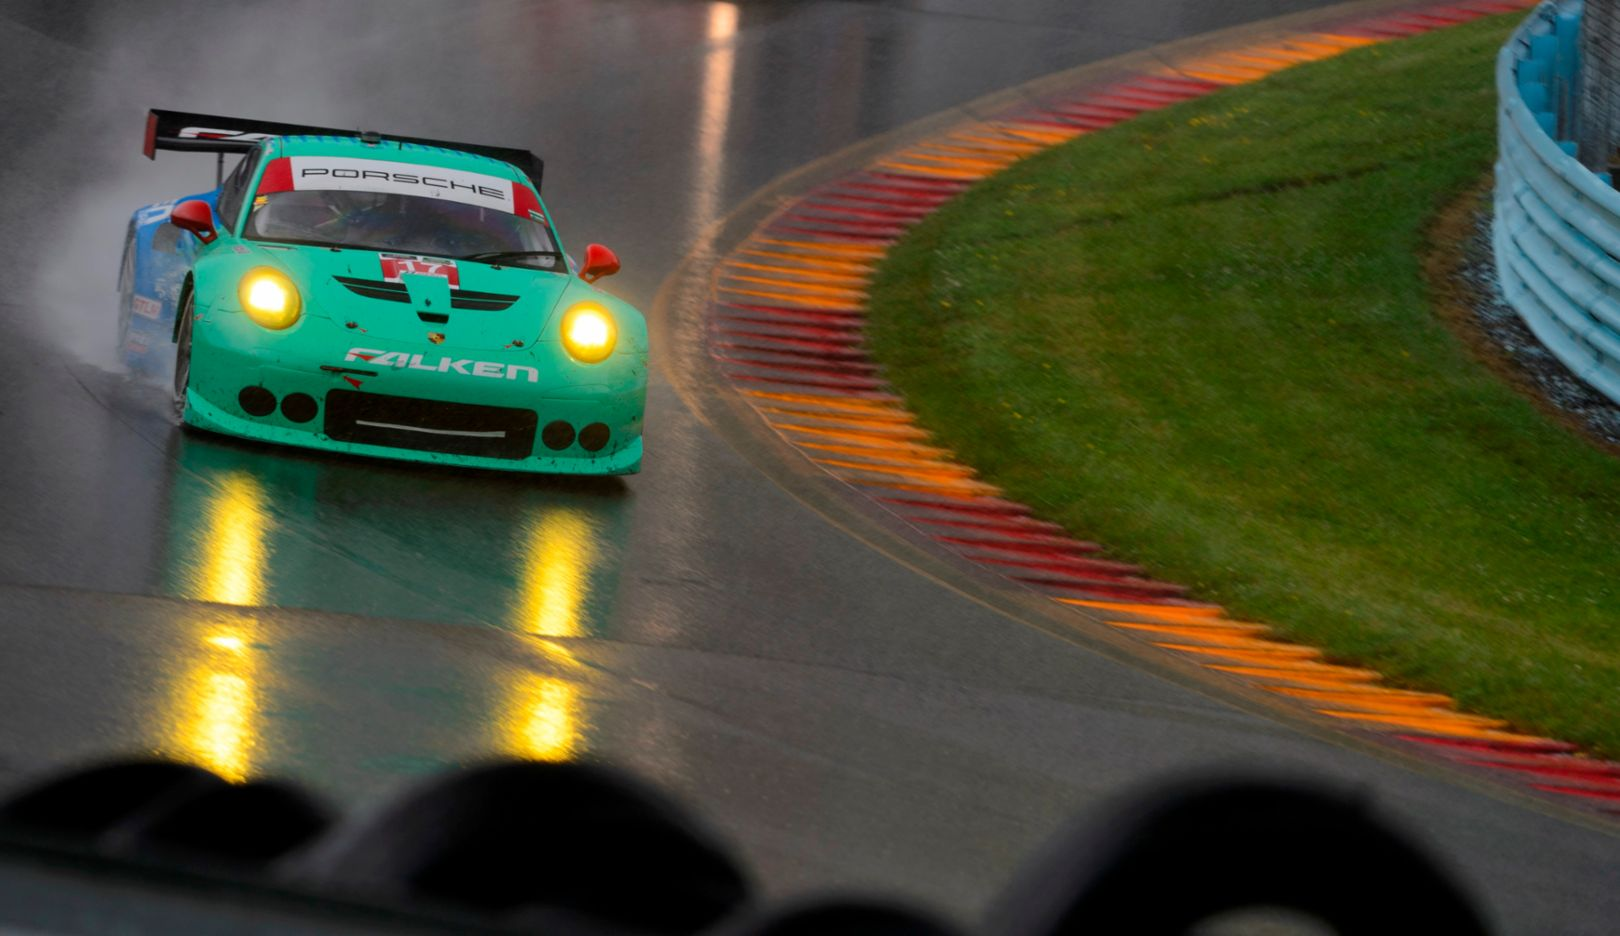 Team Falken Tire: Wolf Henzler, Bryan Sellers, Porsche 911 RSR, Watkins Glen 2015, Porsche AG